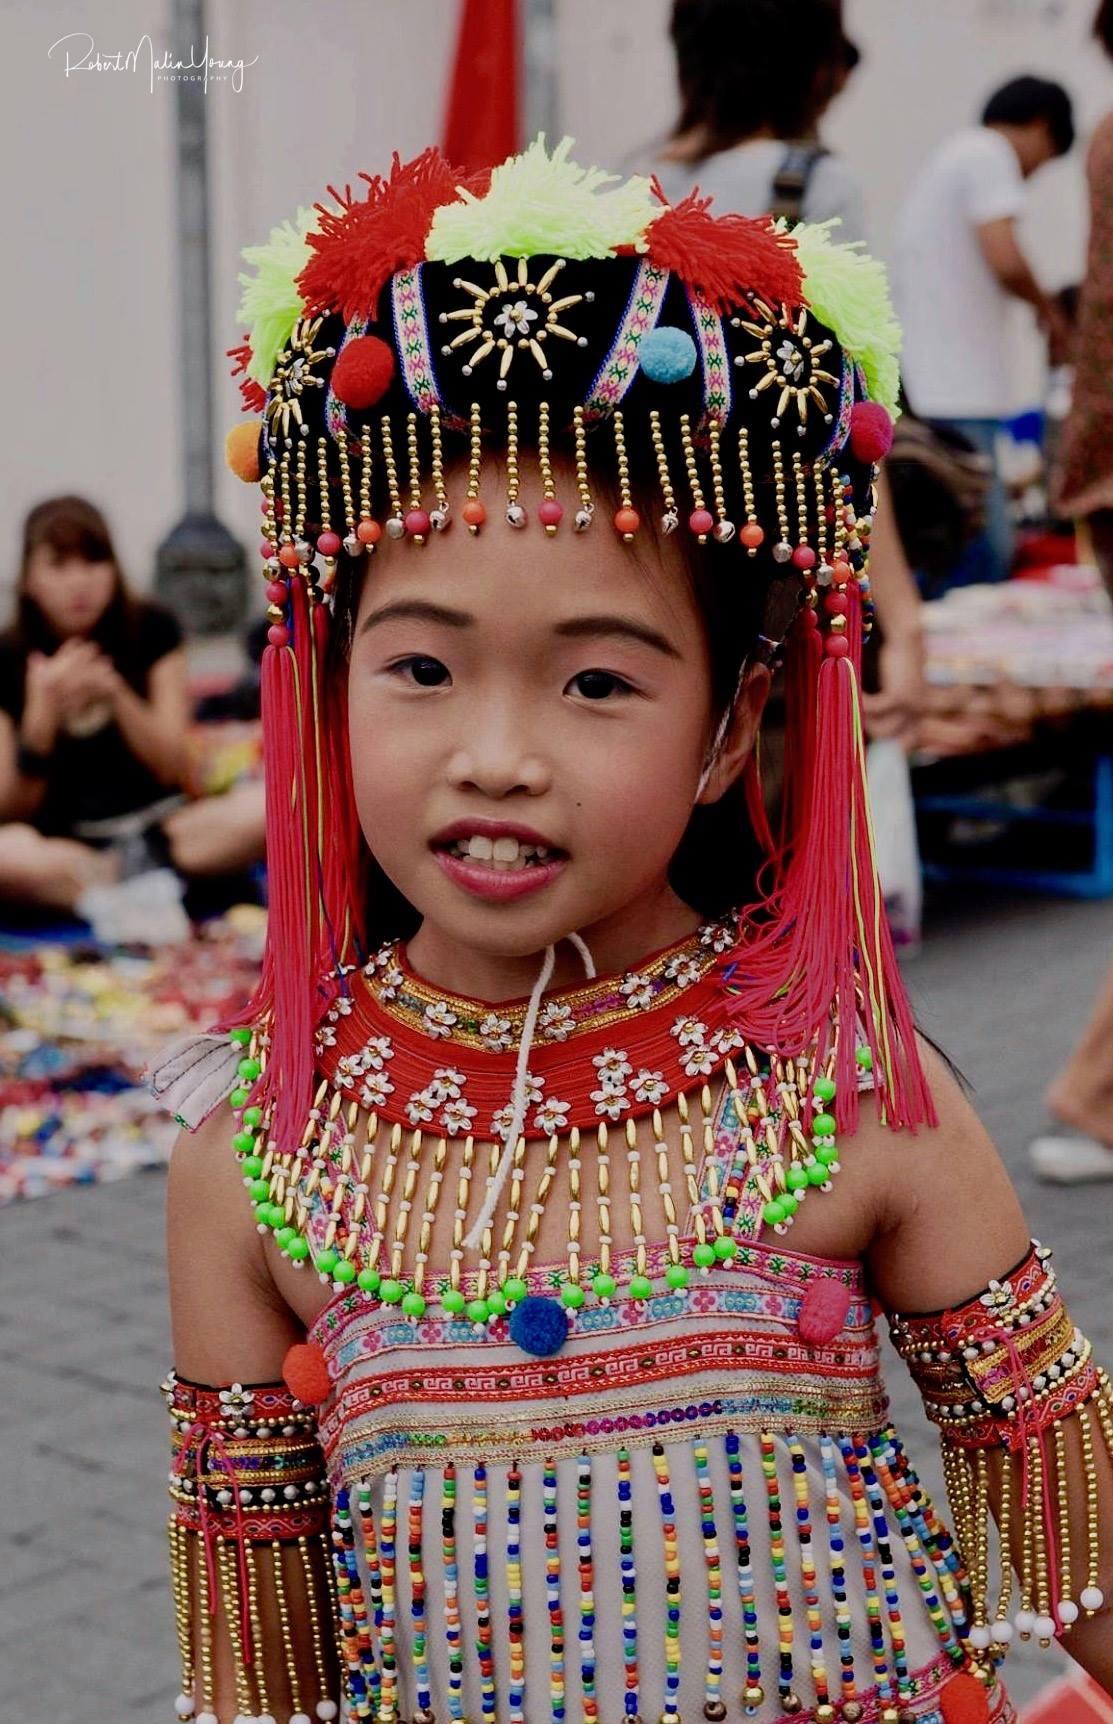 Chang Mai - Thailand 2017 by Robert Malin Young